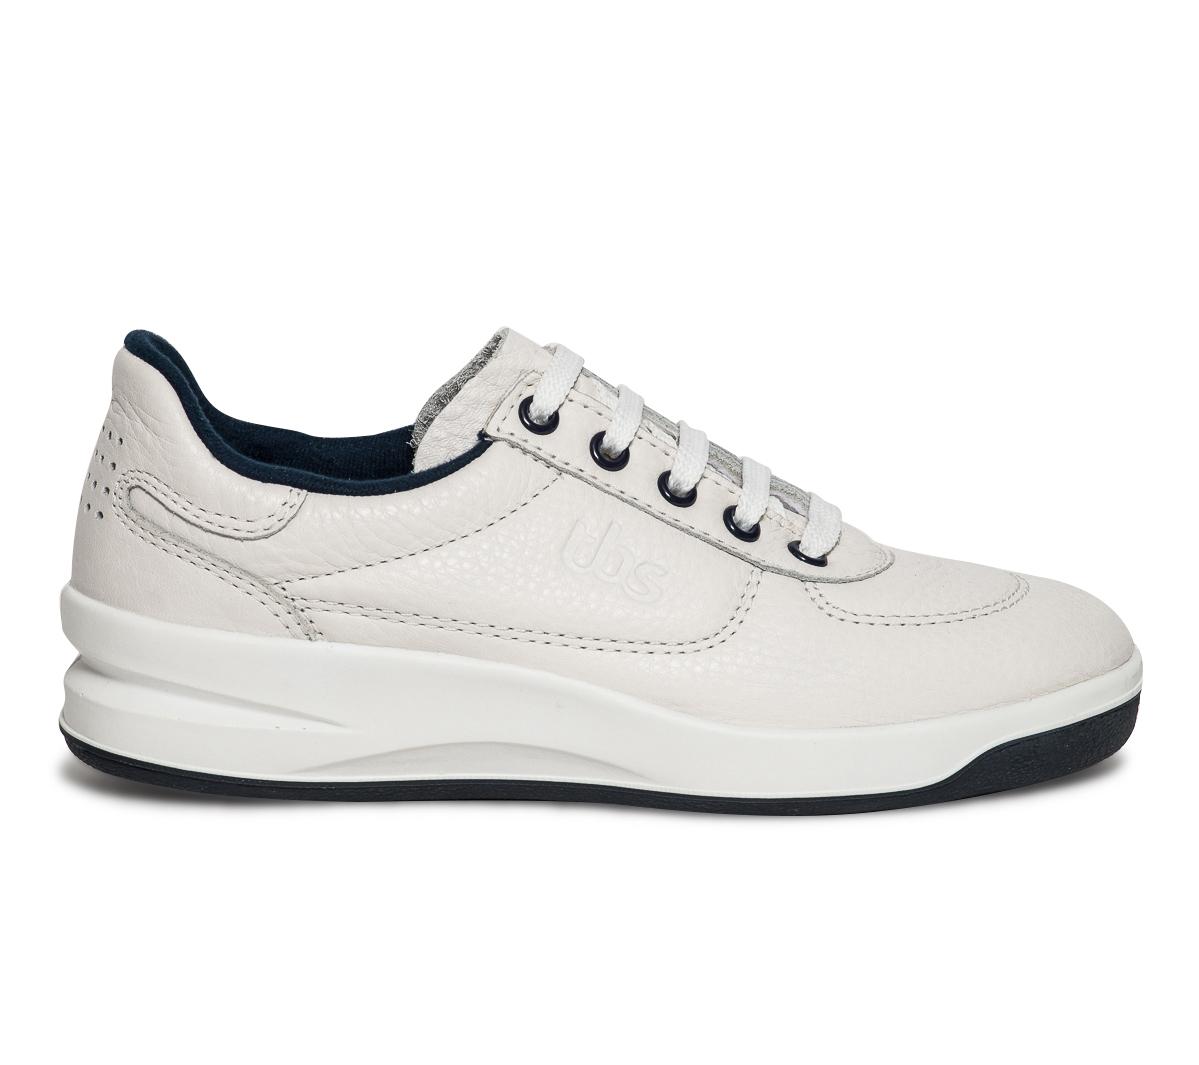 Cuir Cuir Tennis Blanc Tbs Tennis Blanc Tbs Tbs Tennis Blanc Tennis Cuir qzSUVMGp